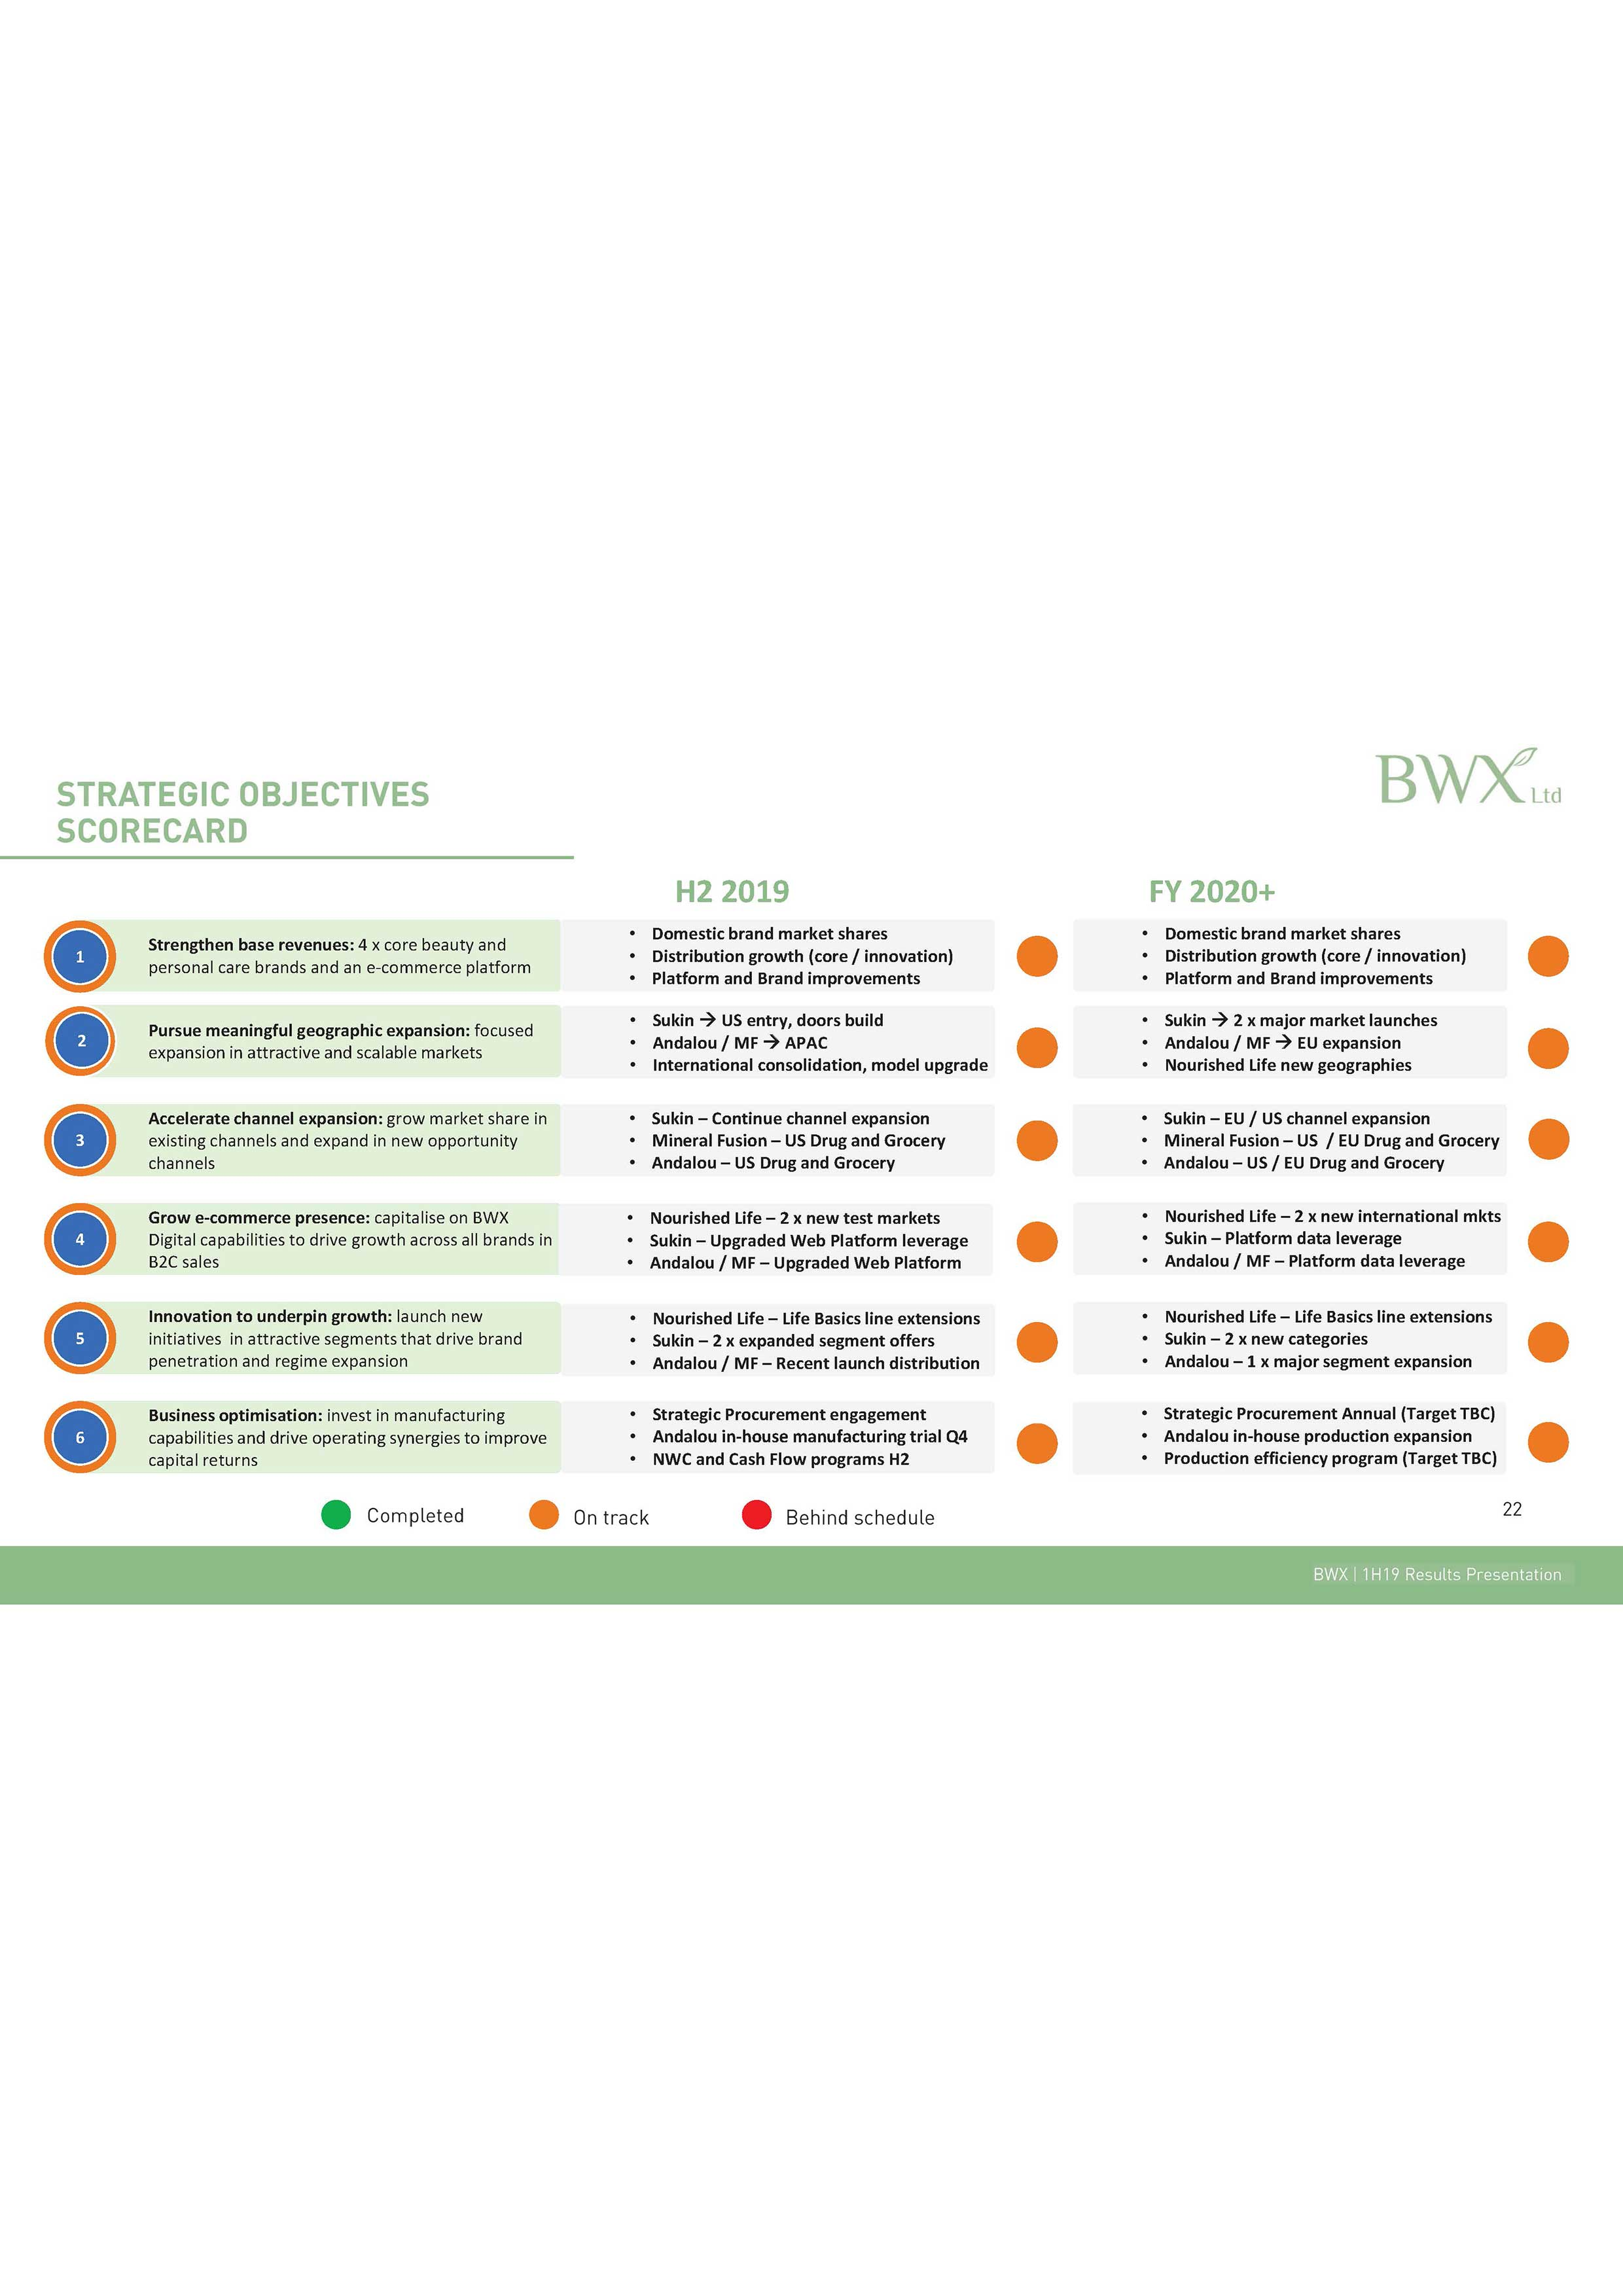 BWX Ltd H1FY19 Results Presentation - Page22